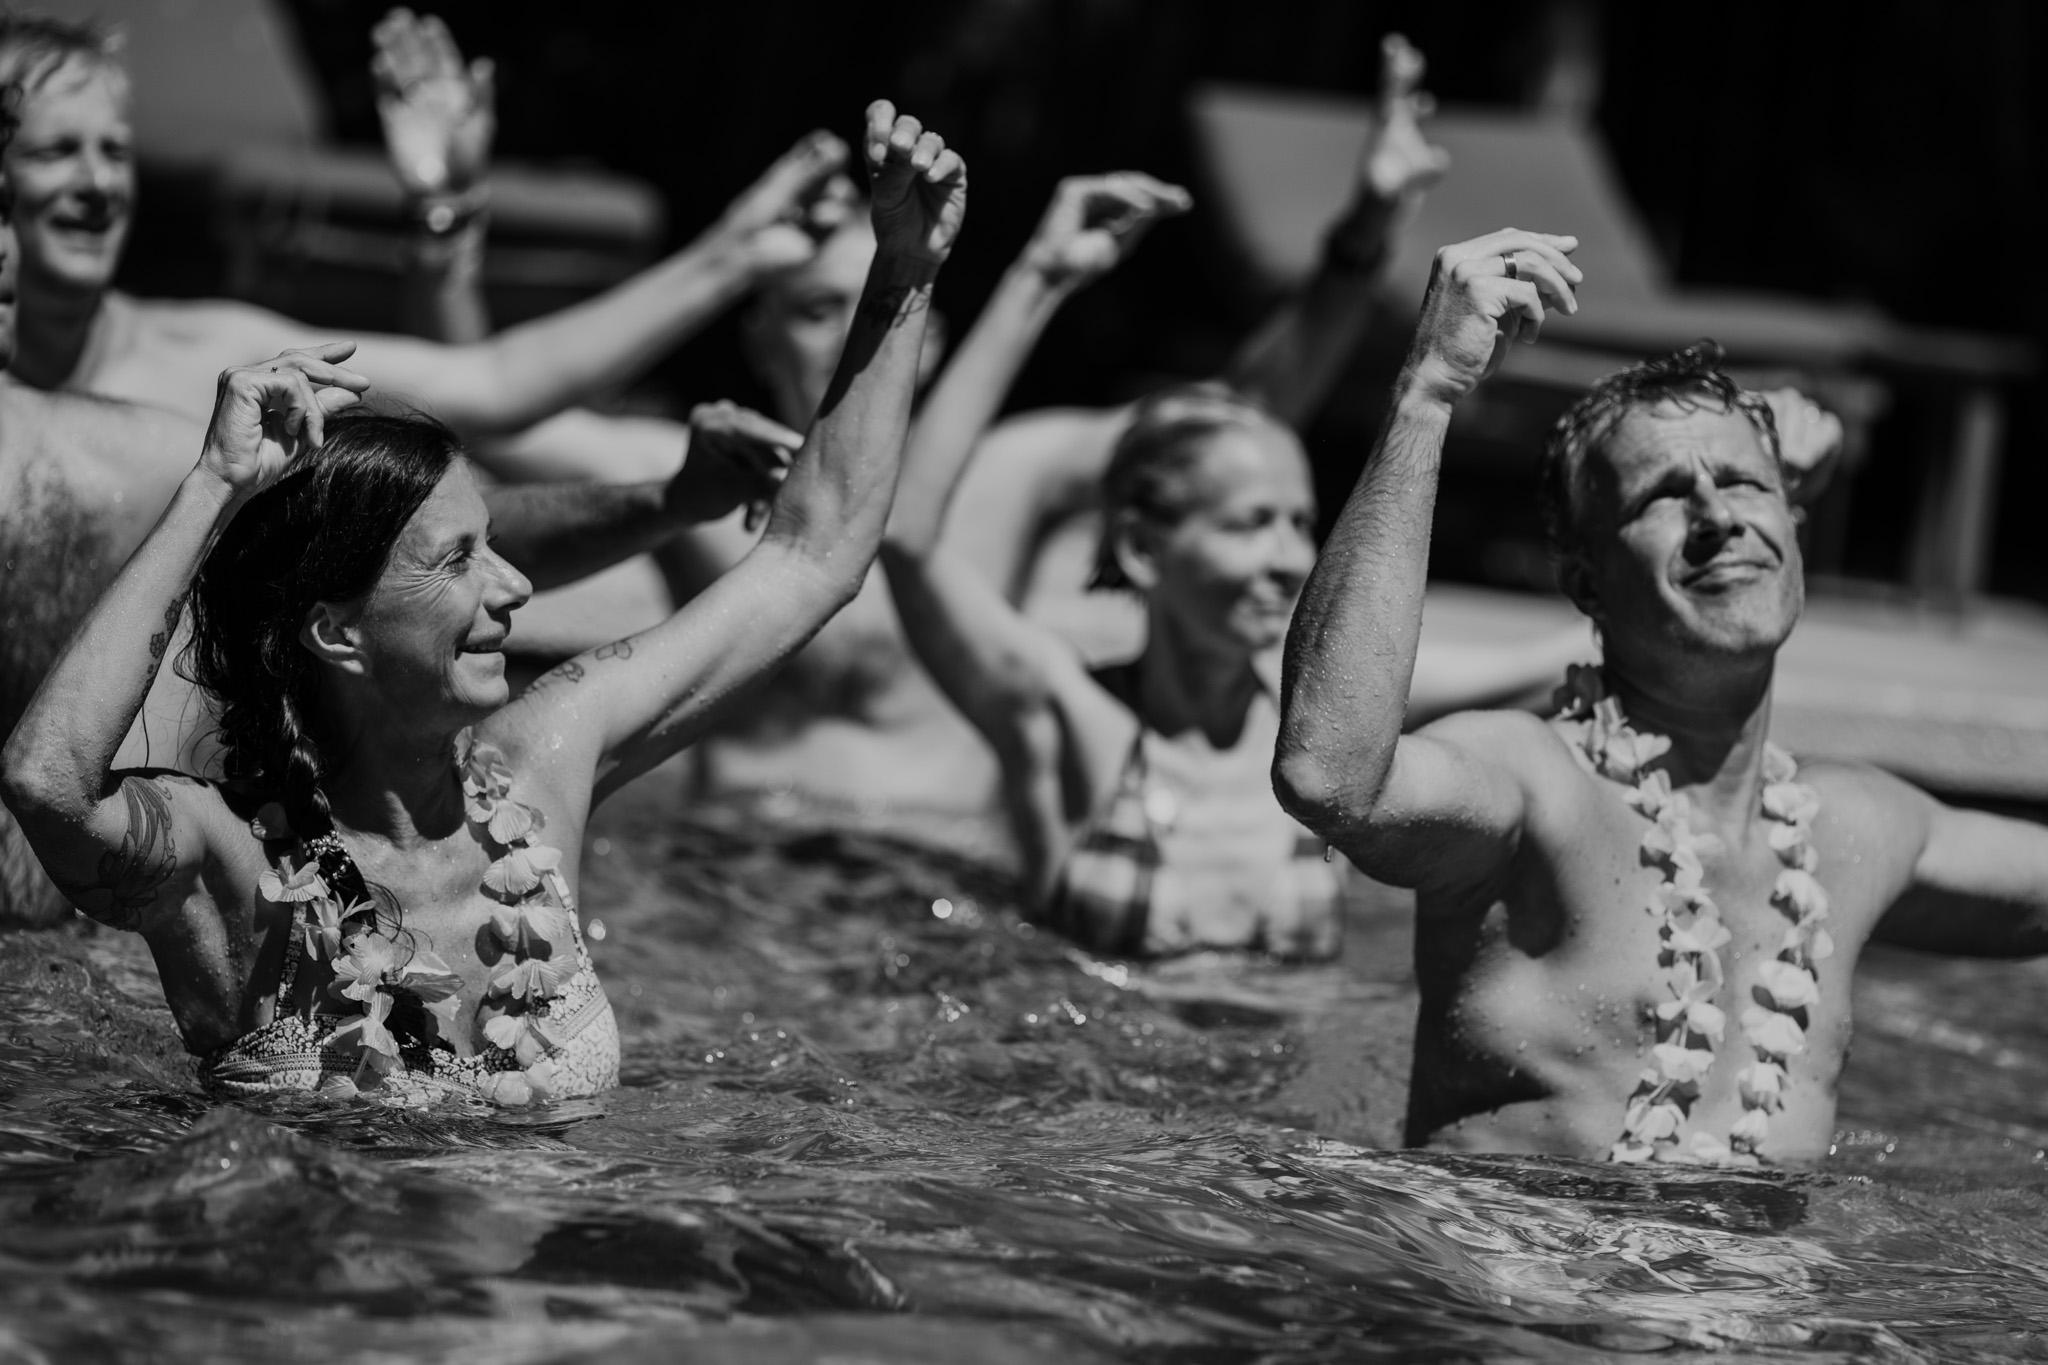 wedding-vow-renewal-hawaii-hochzeit-maui-silberhochzeit-karol-and-jens_114.jpg